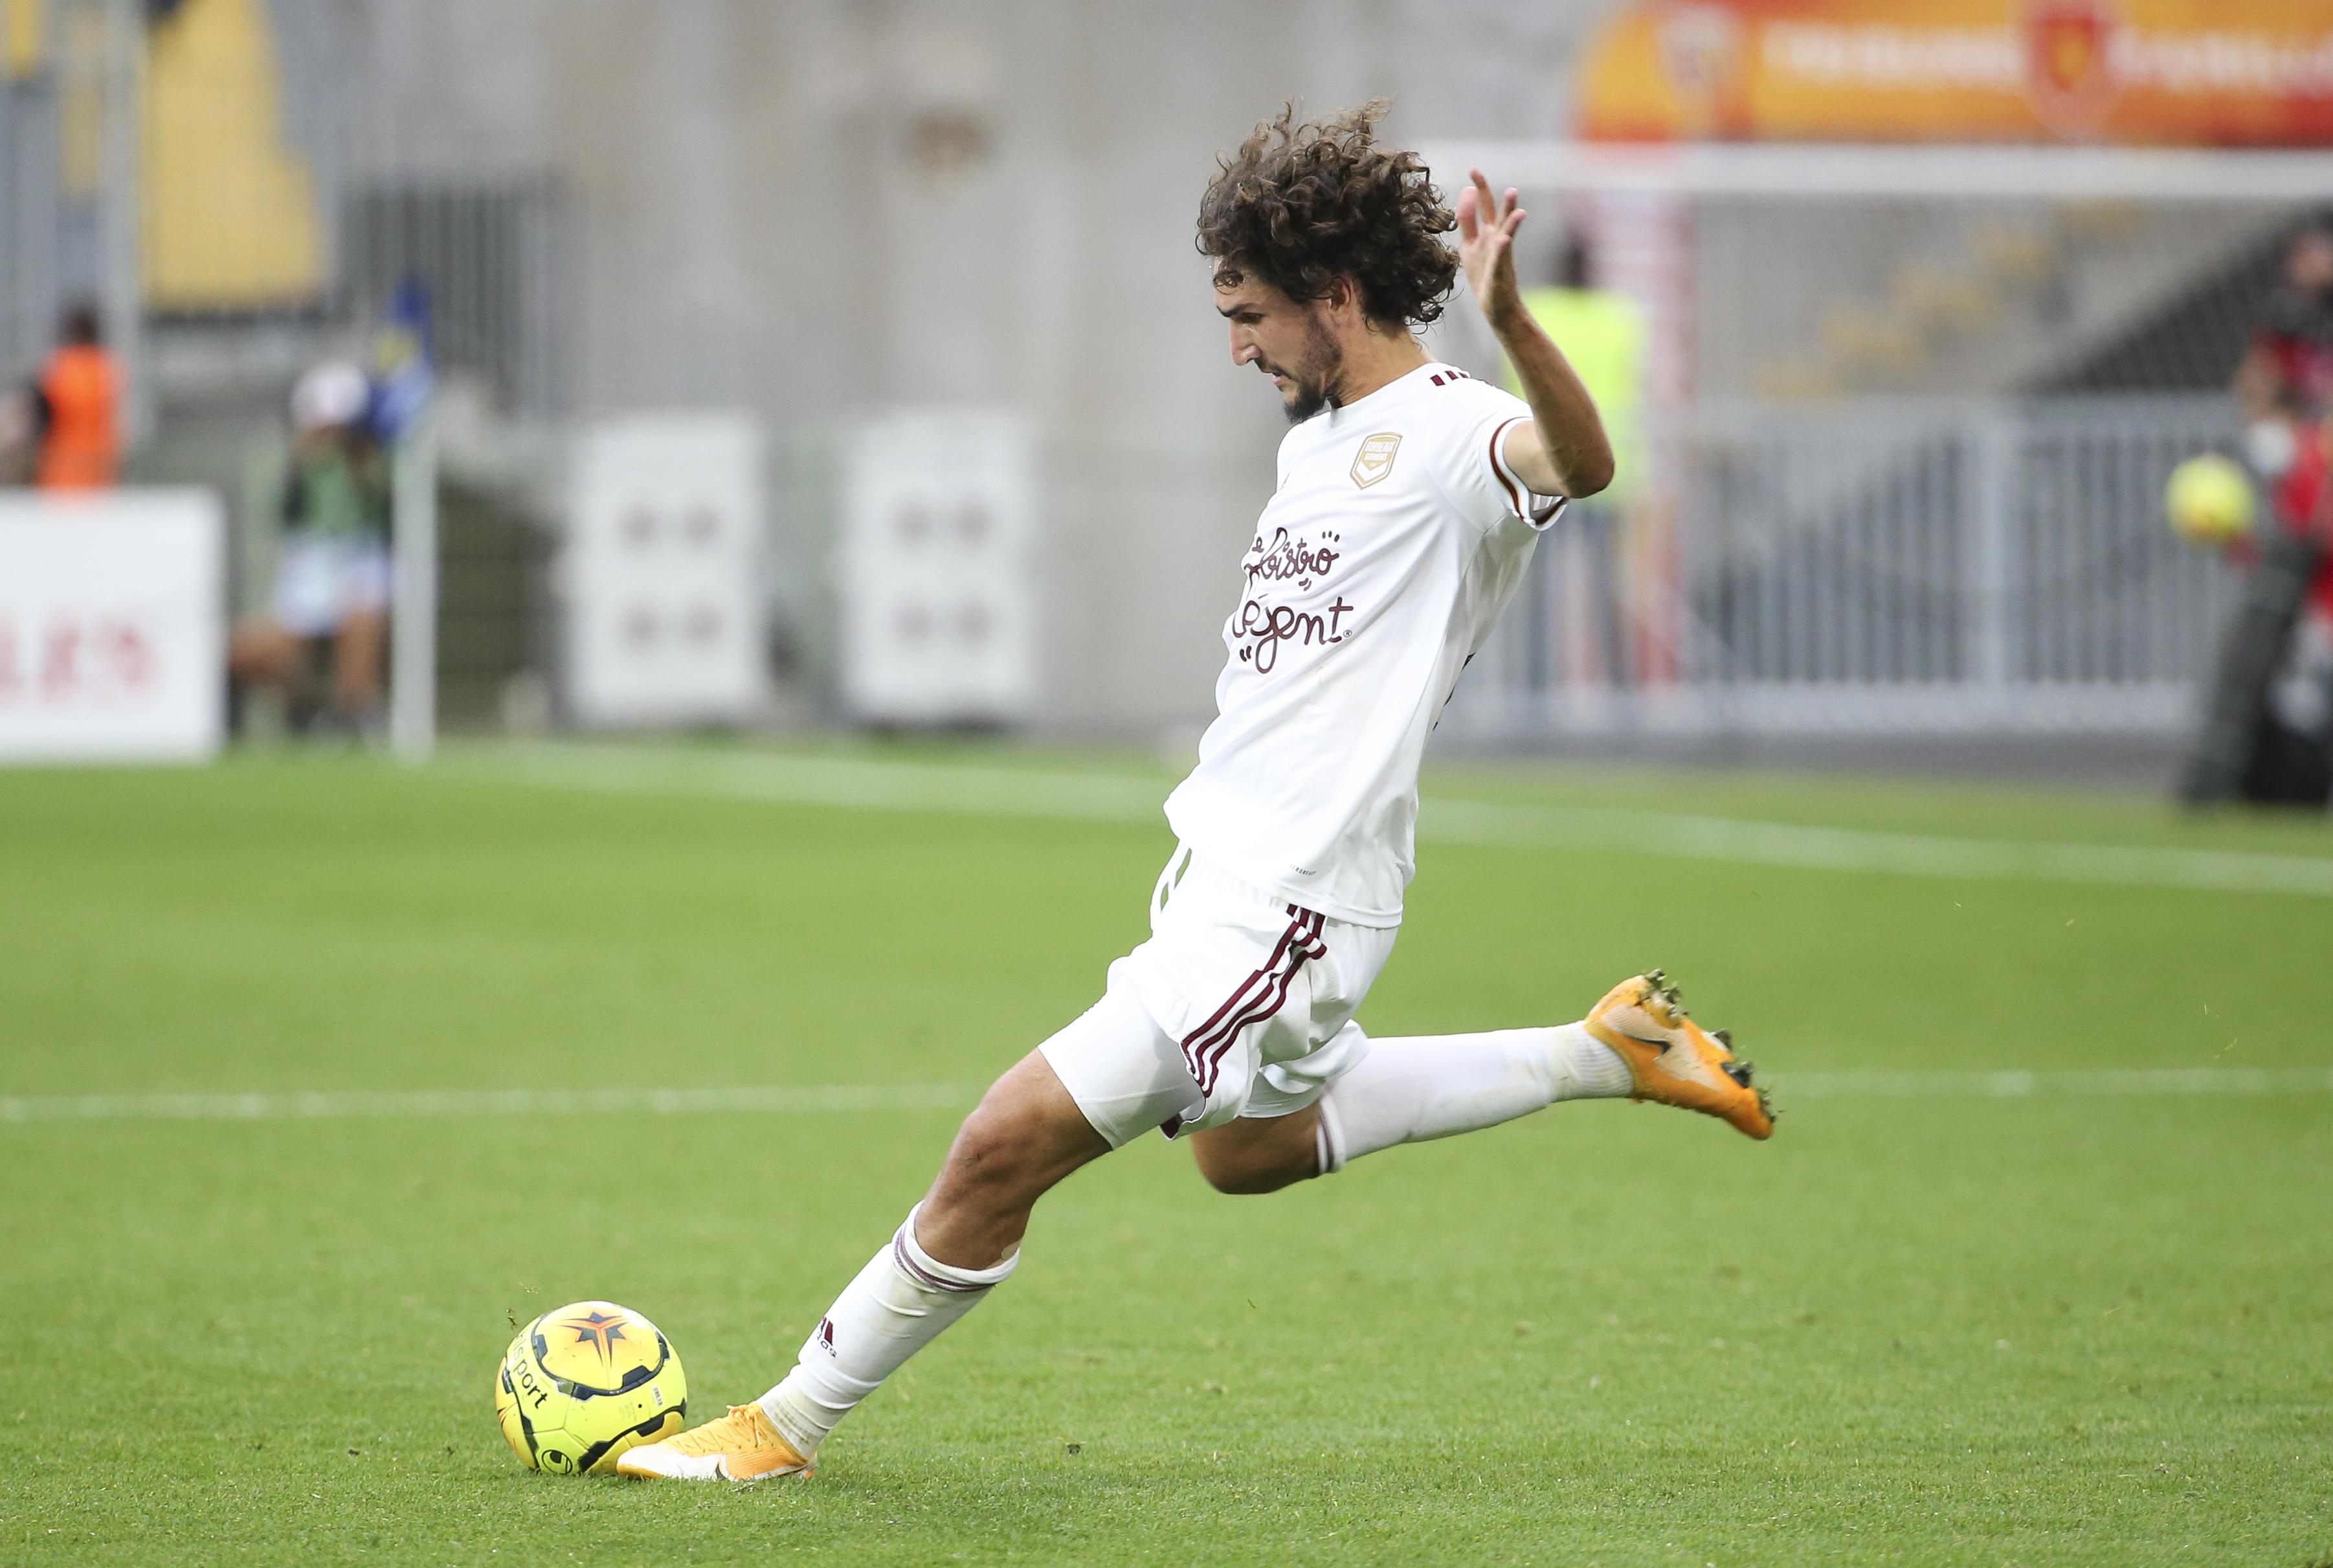 RC Lens v Girondins Bordeaux - Ligue 1